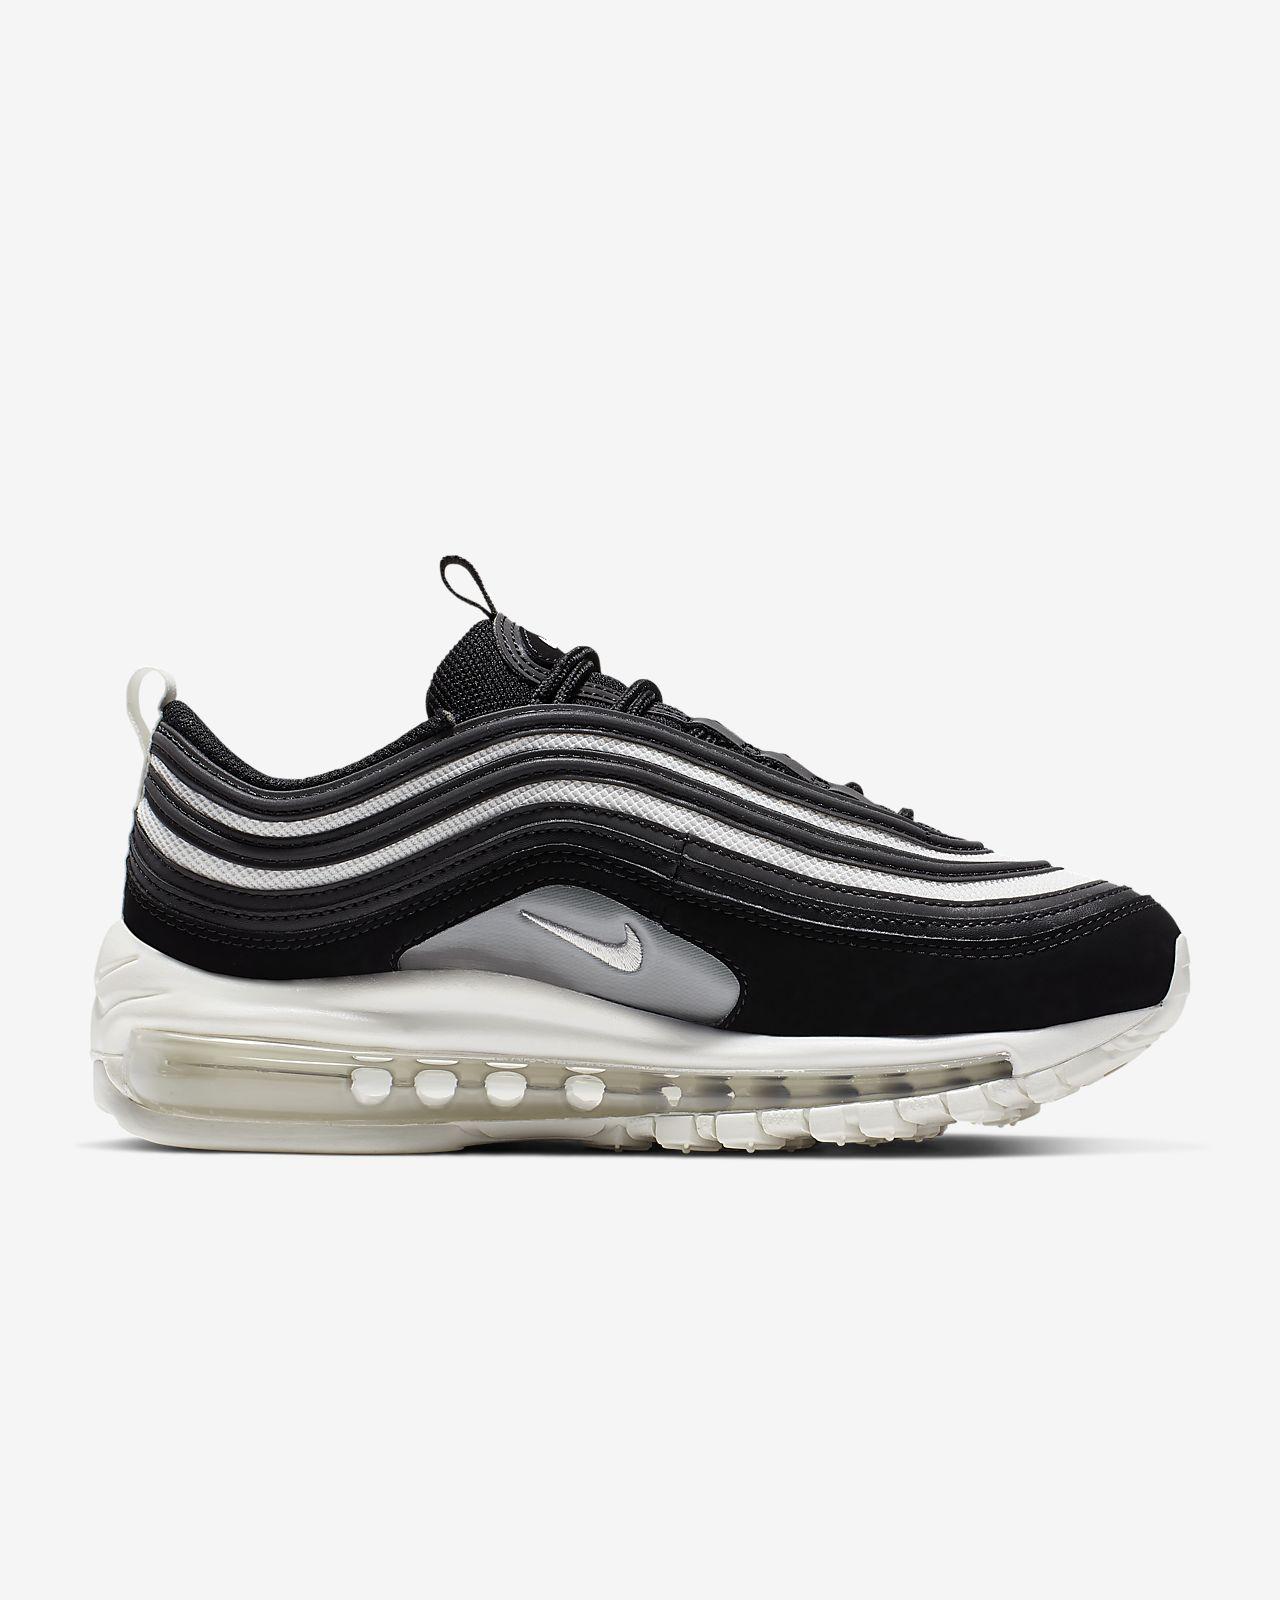 newest 7edf1 33339 Nike Air Max 97 Women's Shoe